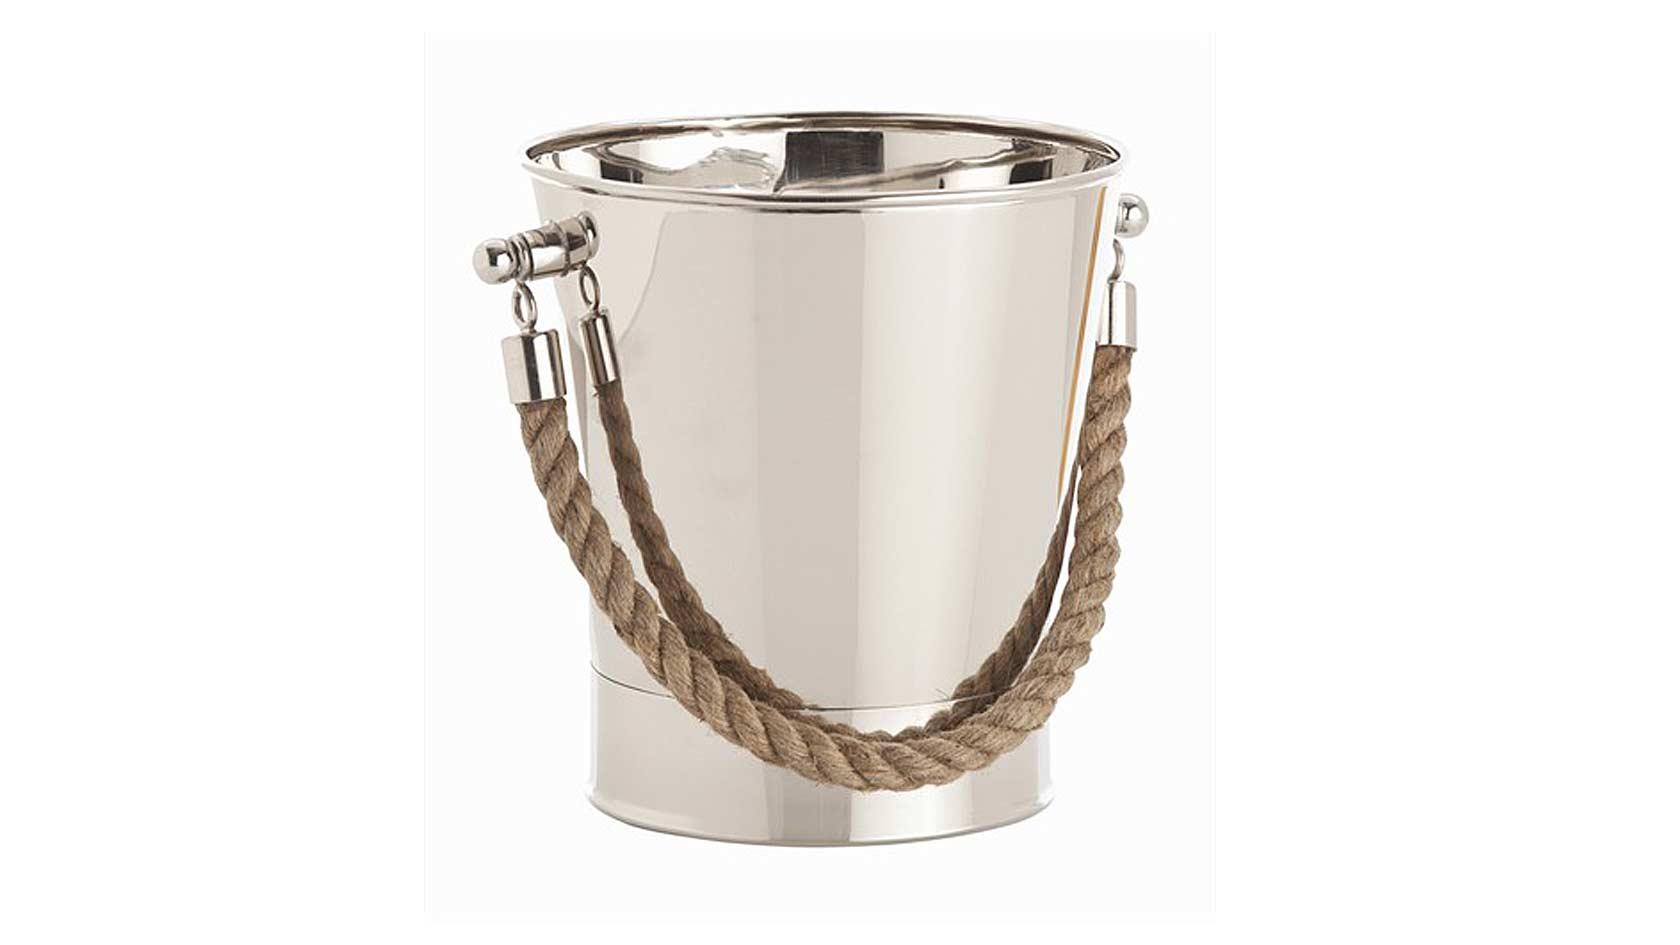 Montauk Rope Polished Nickel Bucket